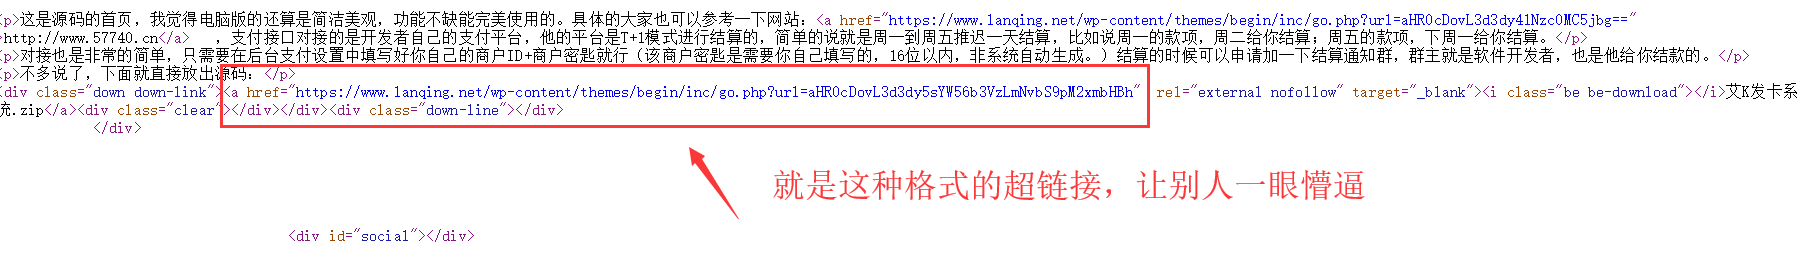 WP知更鸟主题将链接转换为base64加密URL进行访问